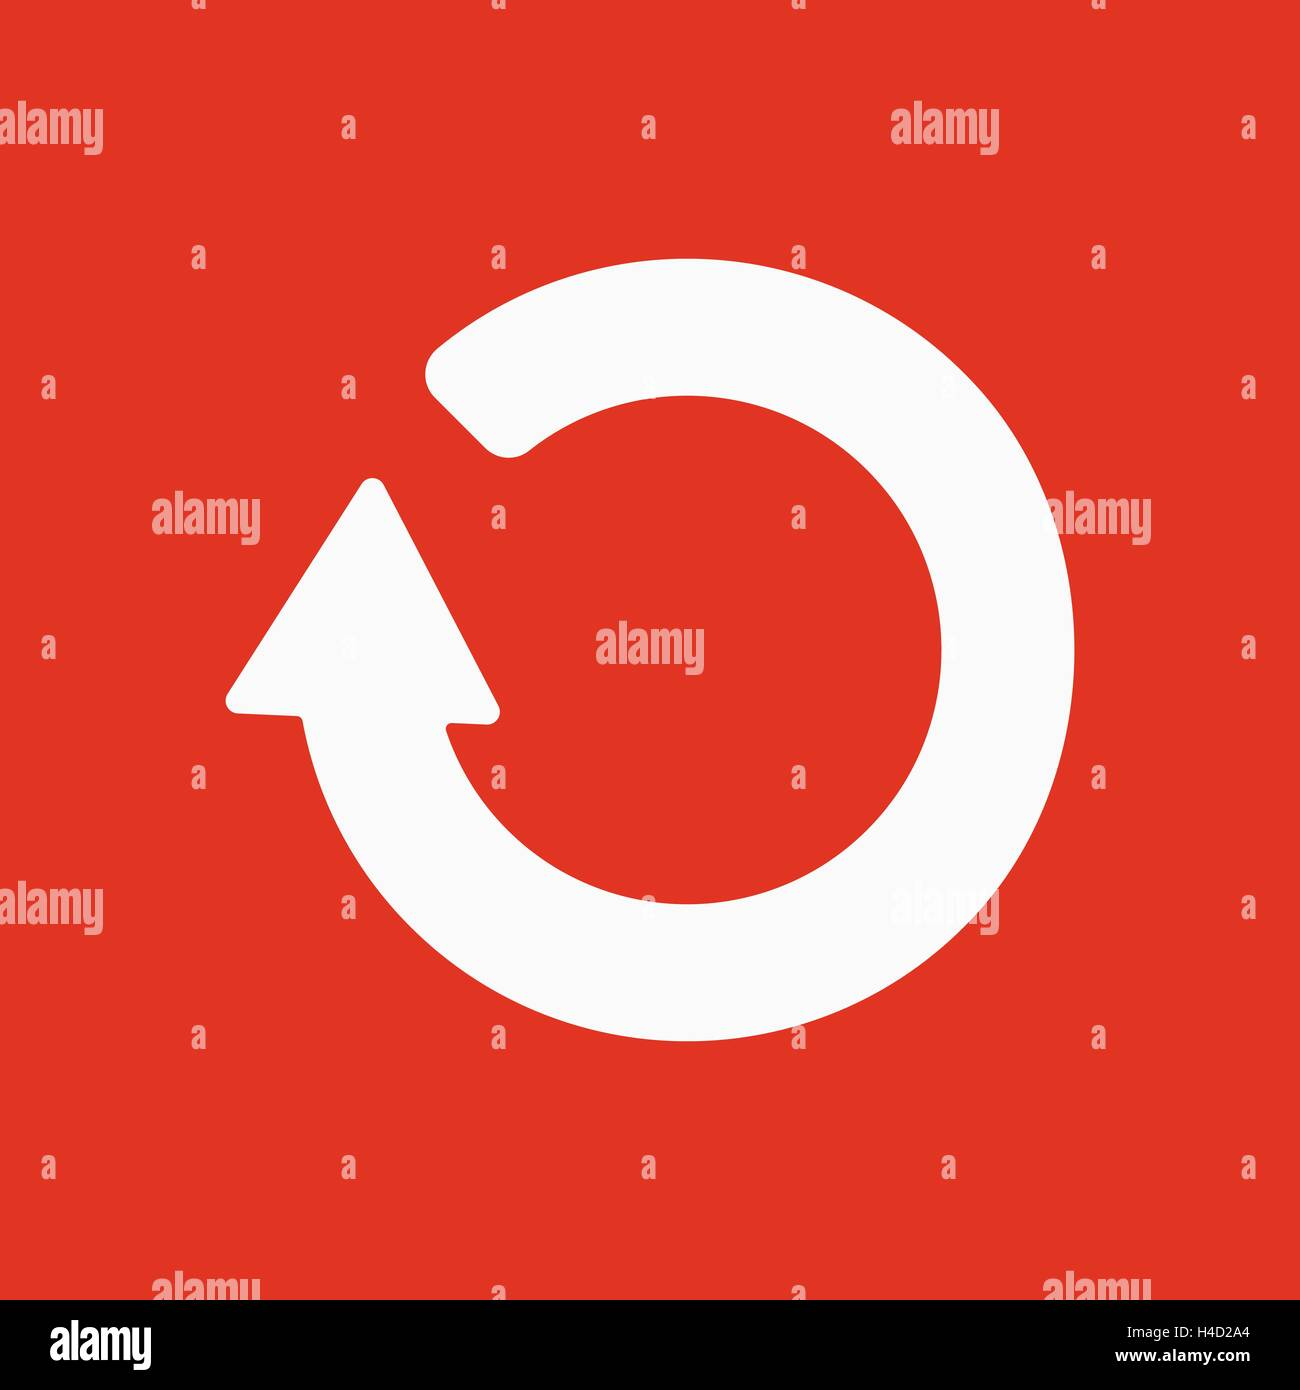 The refresh icon loading symbol flat stock vector art loading symbol flat biocorpaavc Image collections